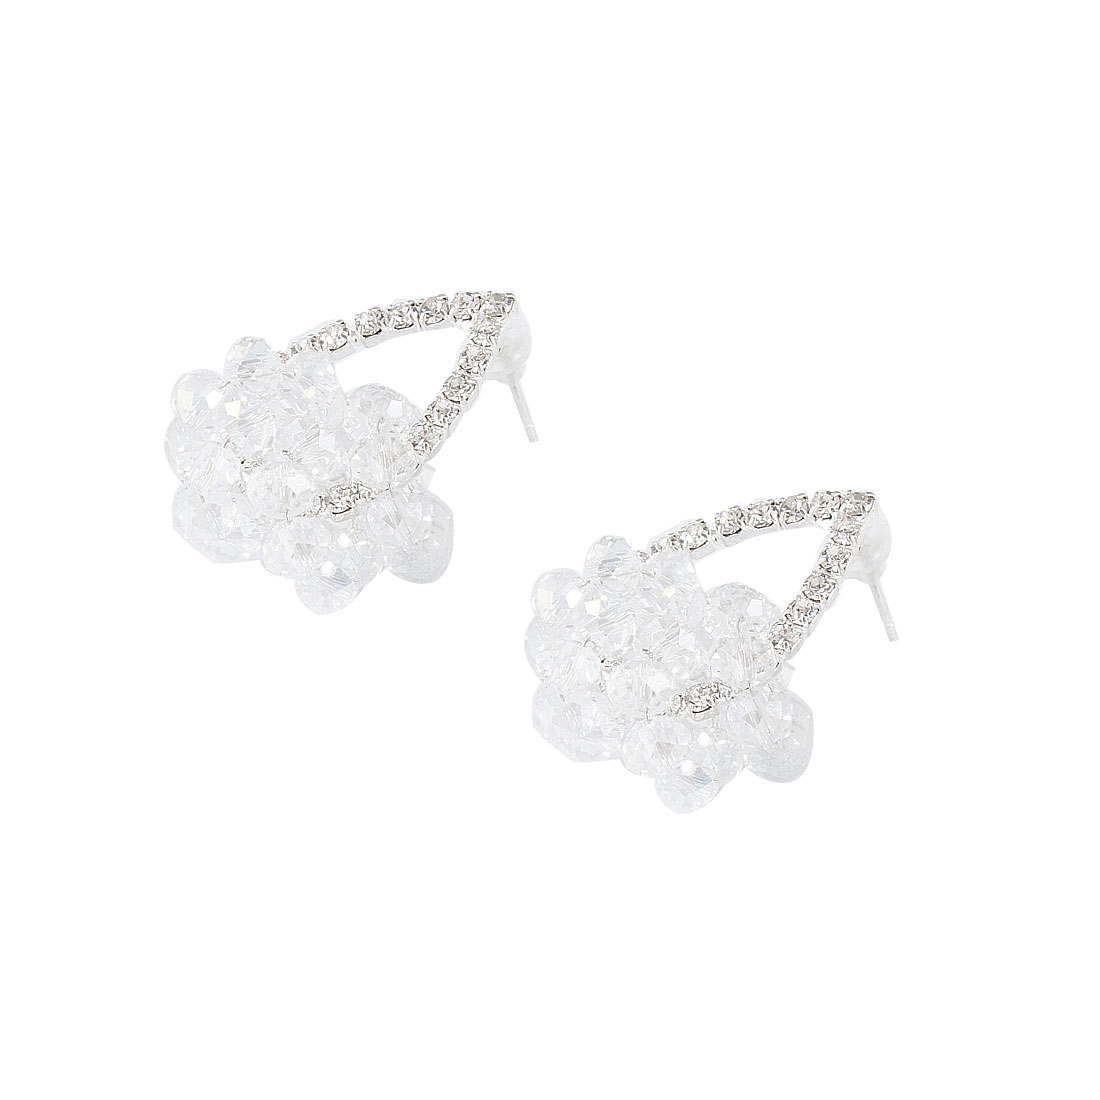 Lady Clear Crystal Decor Rhinestone Water Drop Earbob Stud Earrings Ear Pin Pair